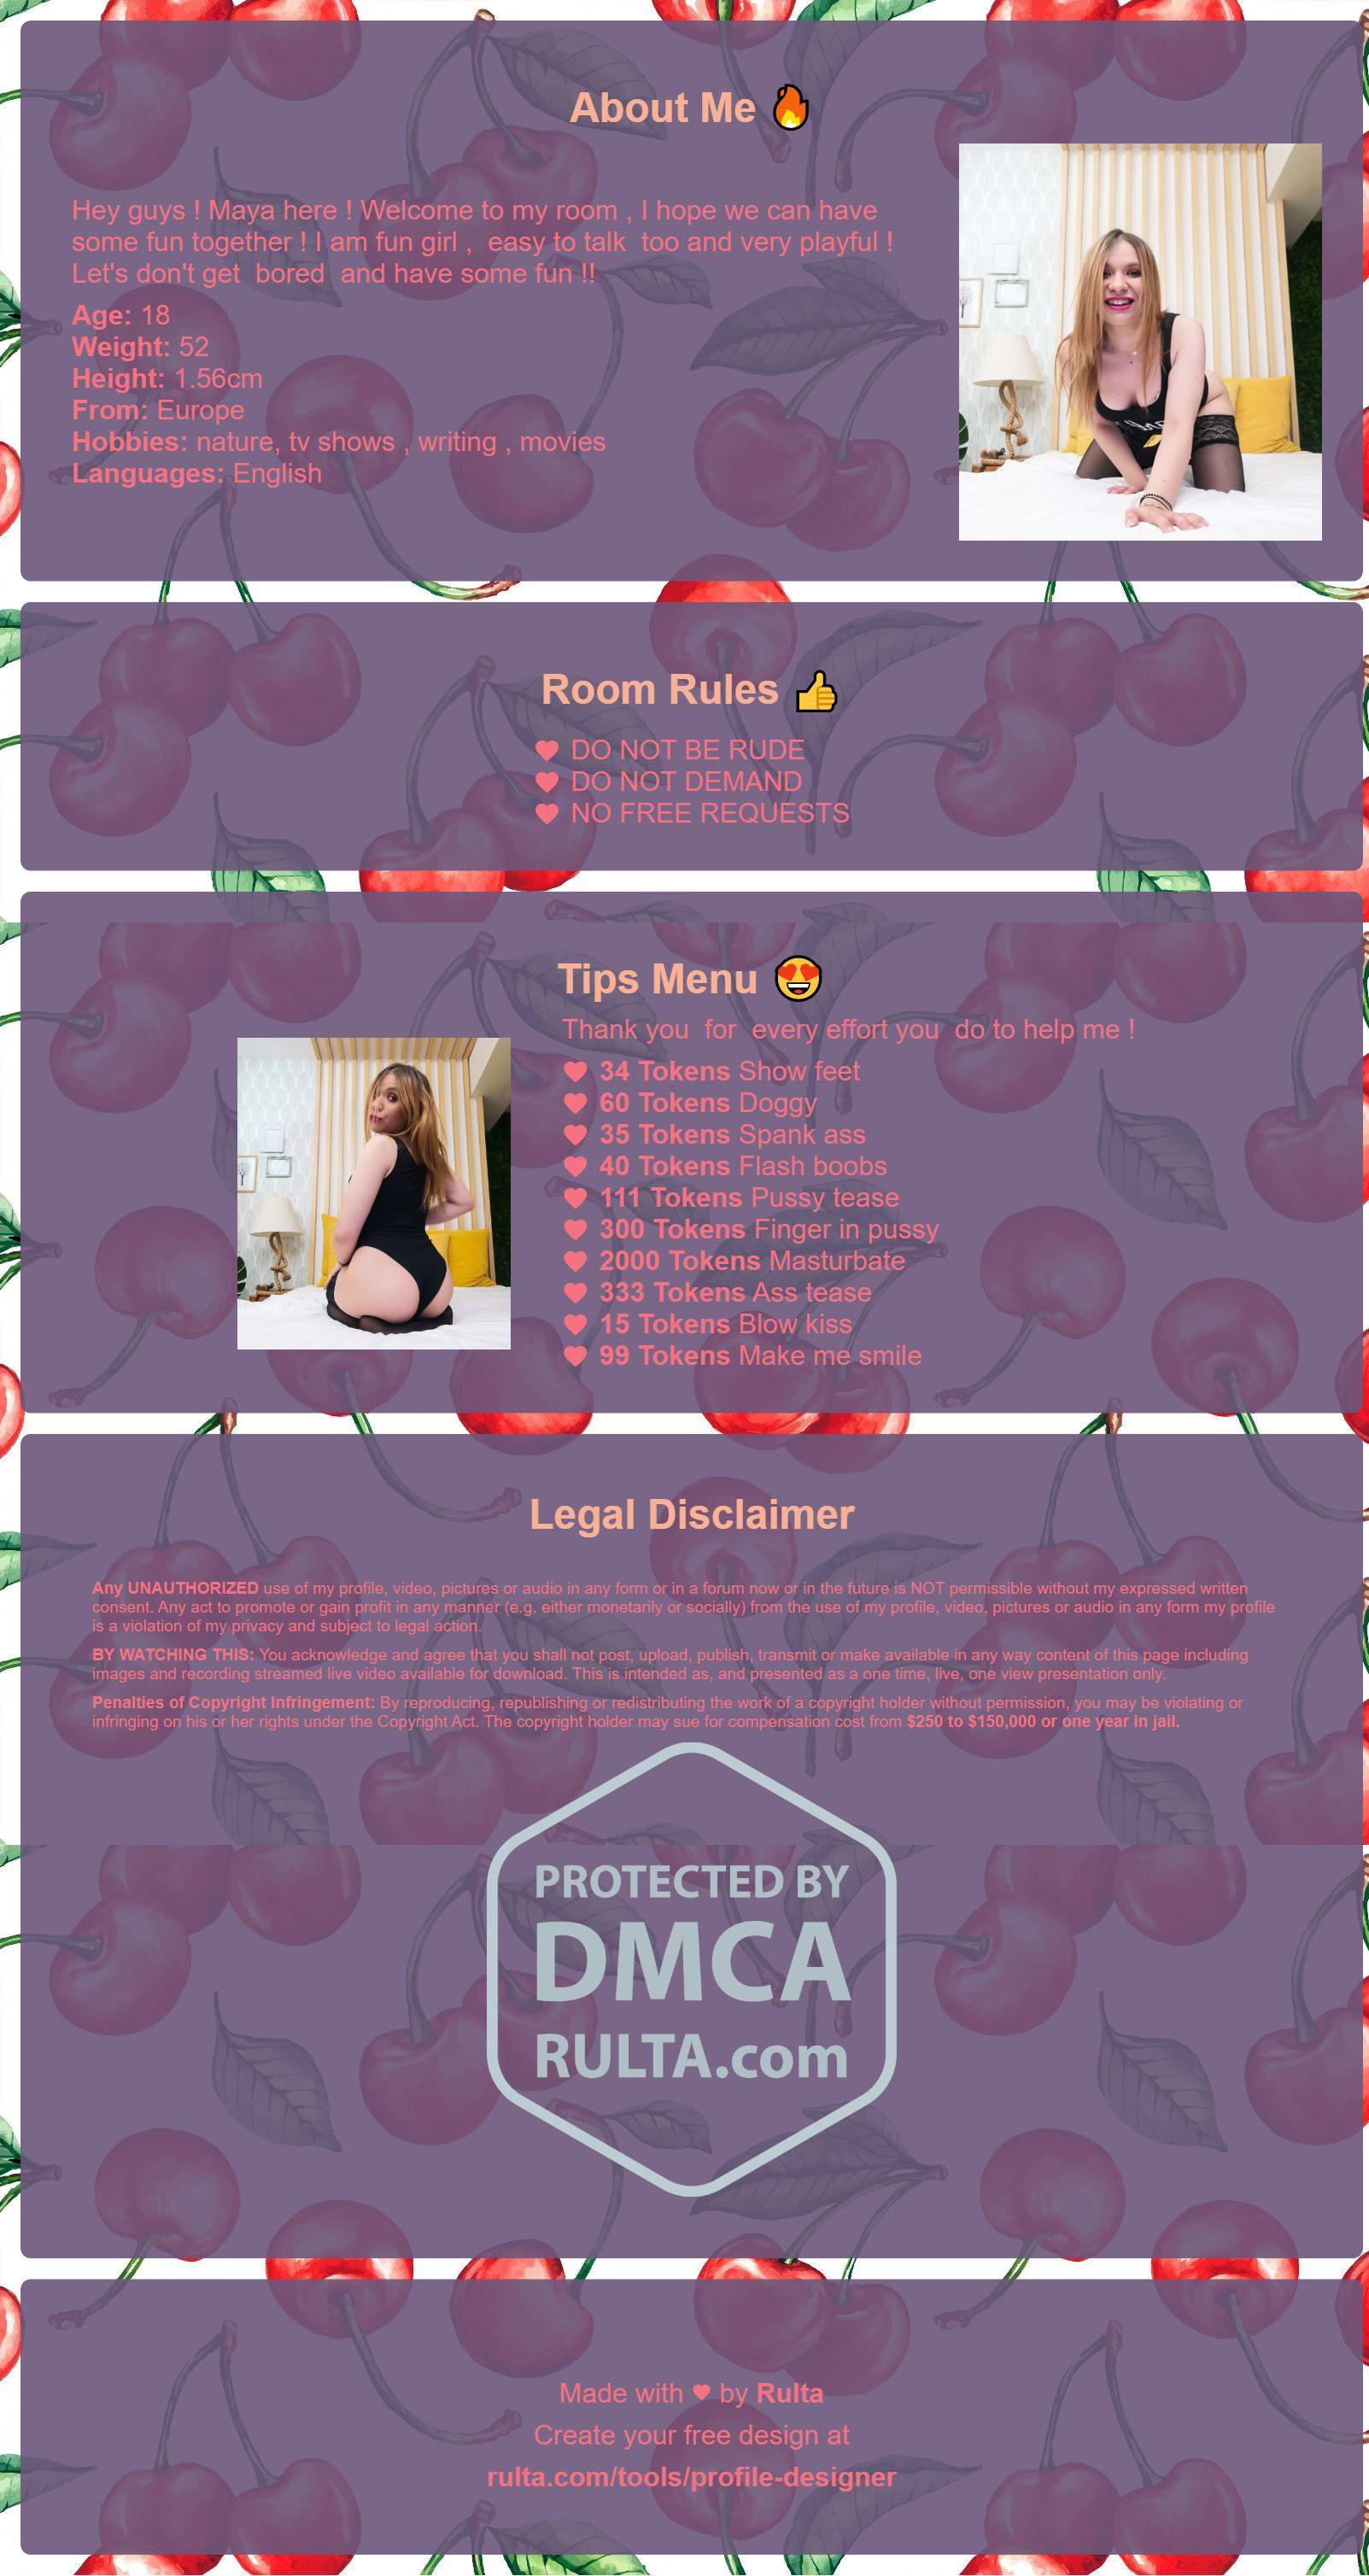 sweetmaya1 profile custom pic 1